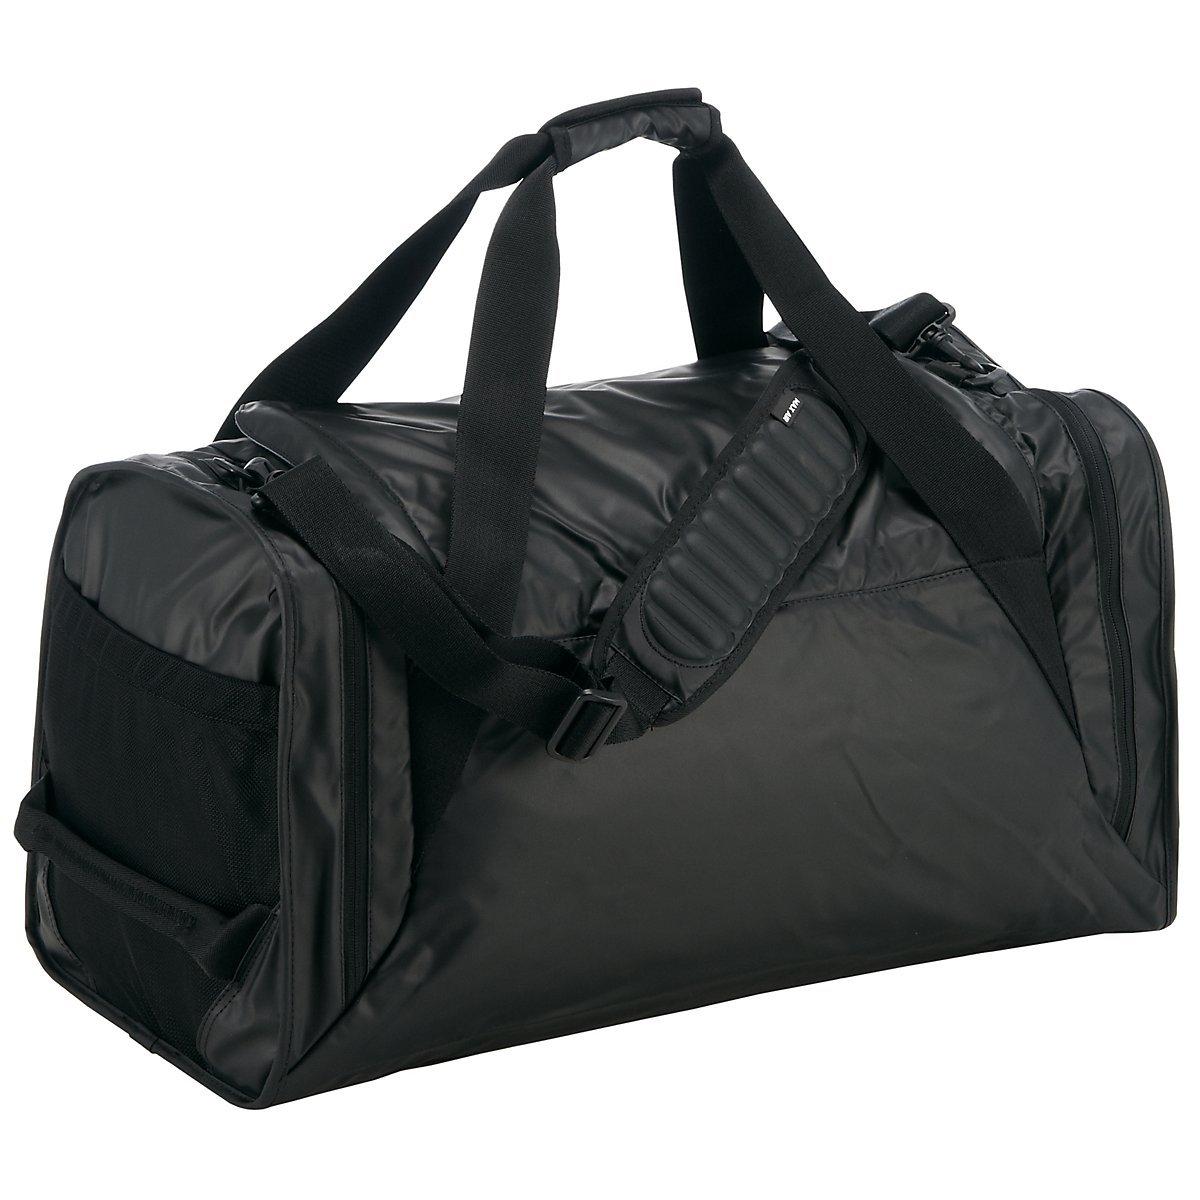 Nike Ultimatum Max Air Duffel Bag - Black White, One Size  Amazon.ca   Electronics eaa897331d